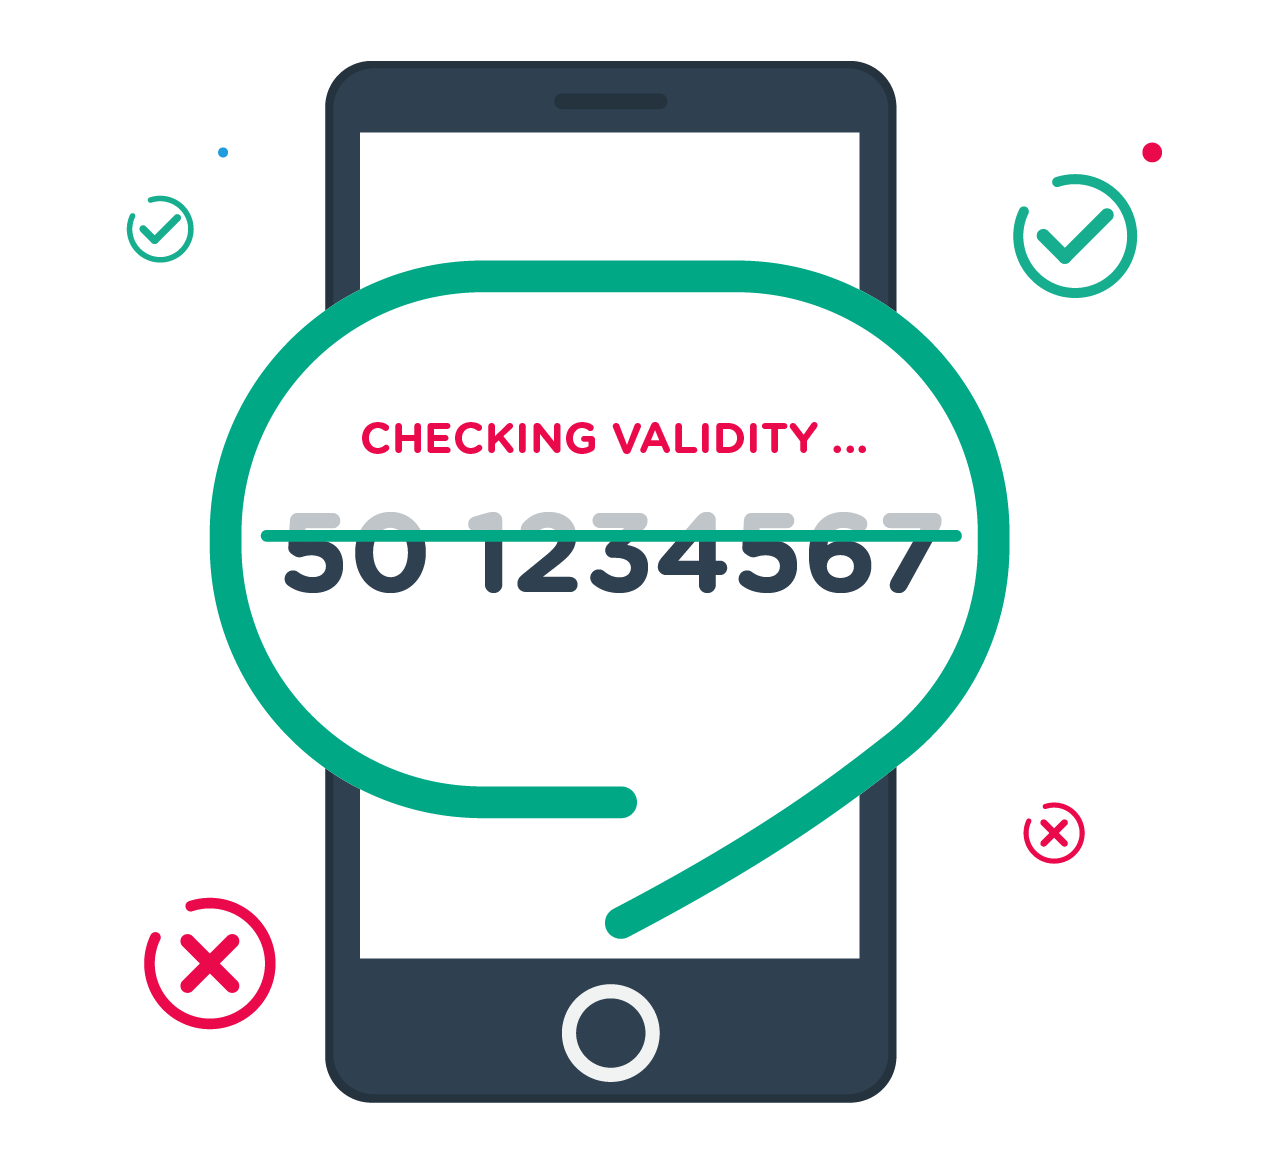 Mobile Number Portability Handling